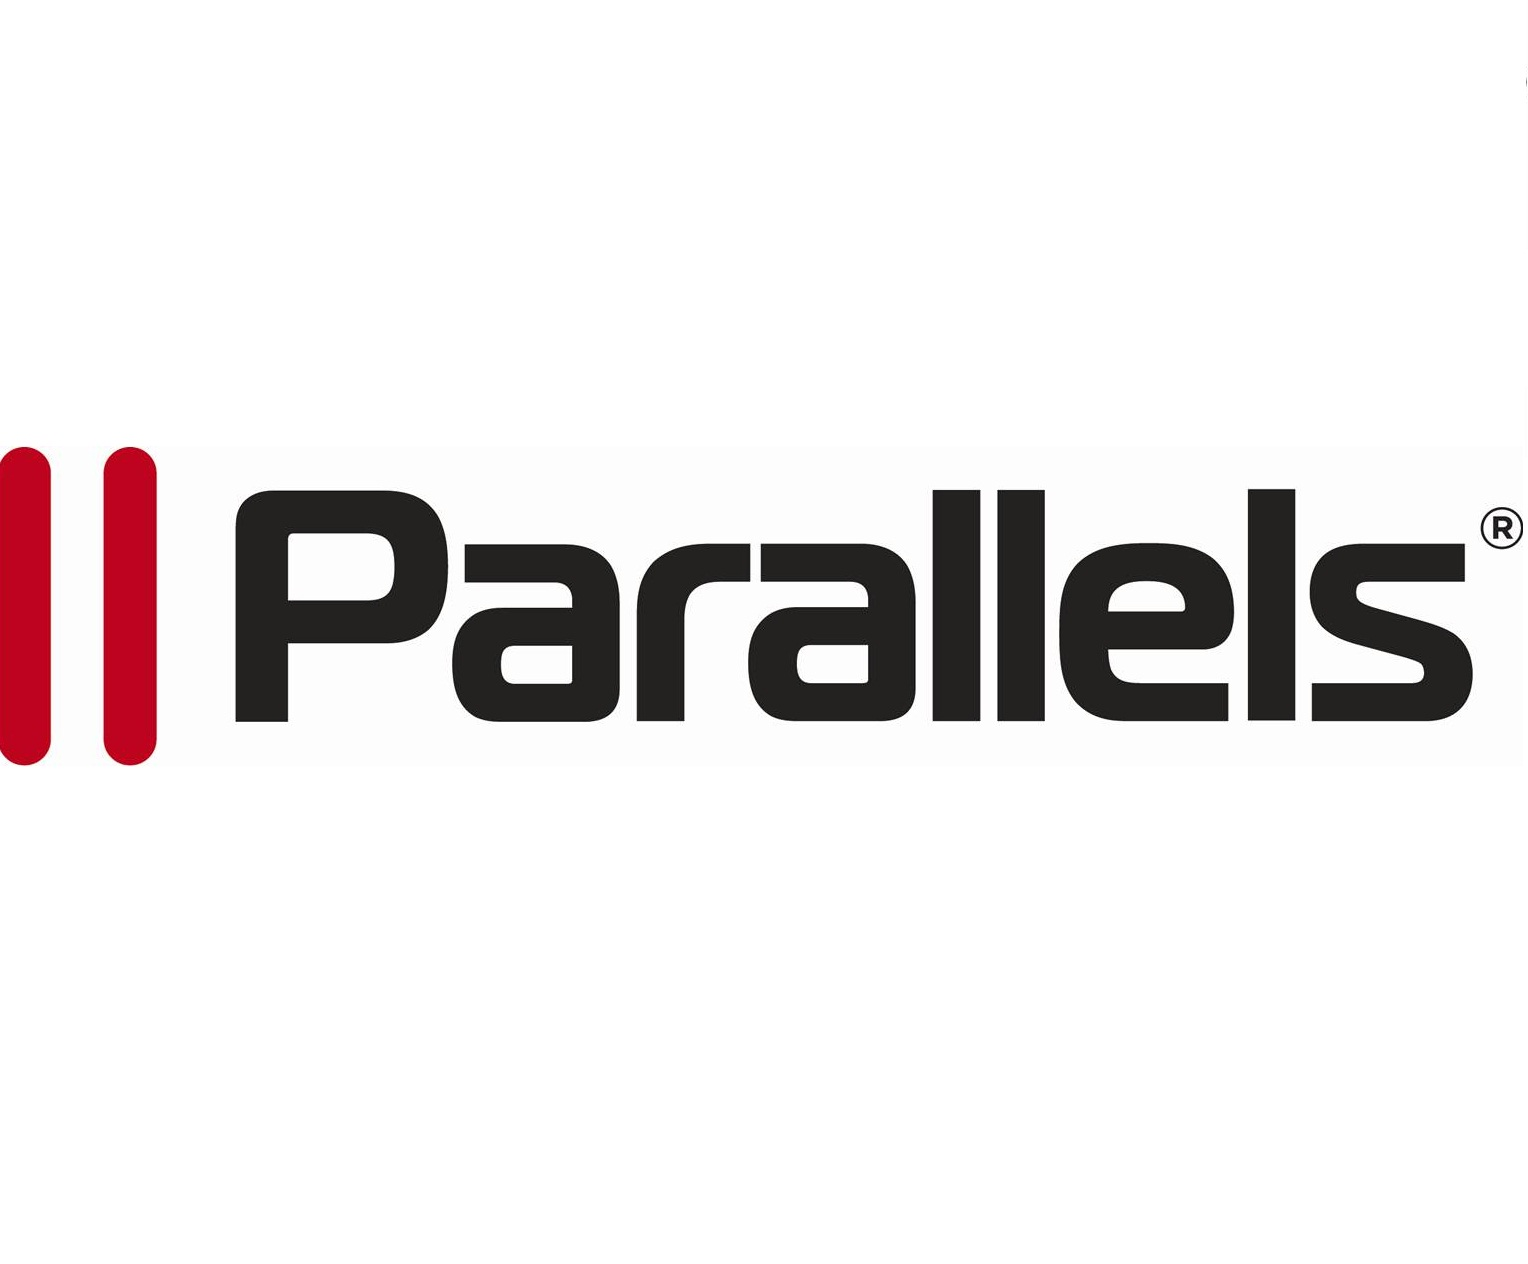 Parallels最新調查發現中國中小型企業(SMB)雲端服務市場潛在商機 市值達167億人民幣